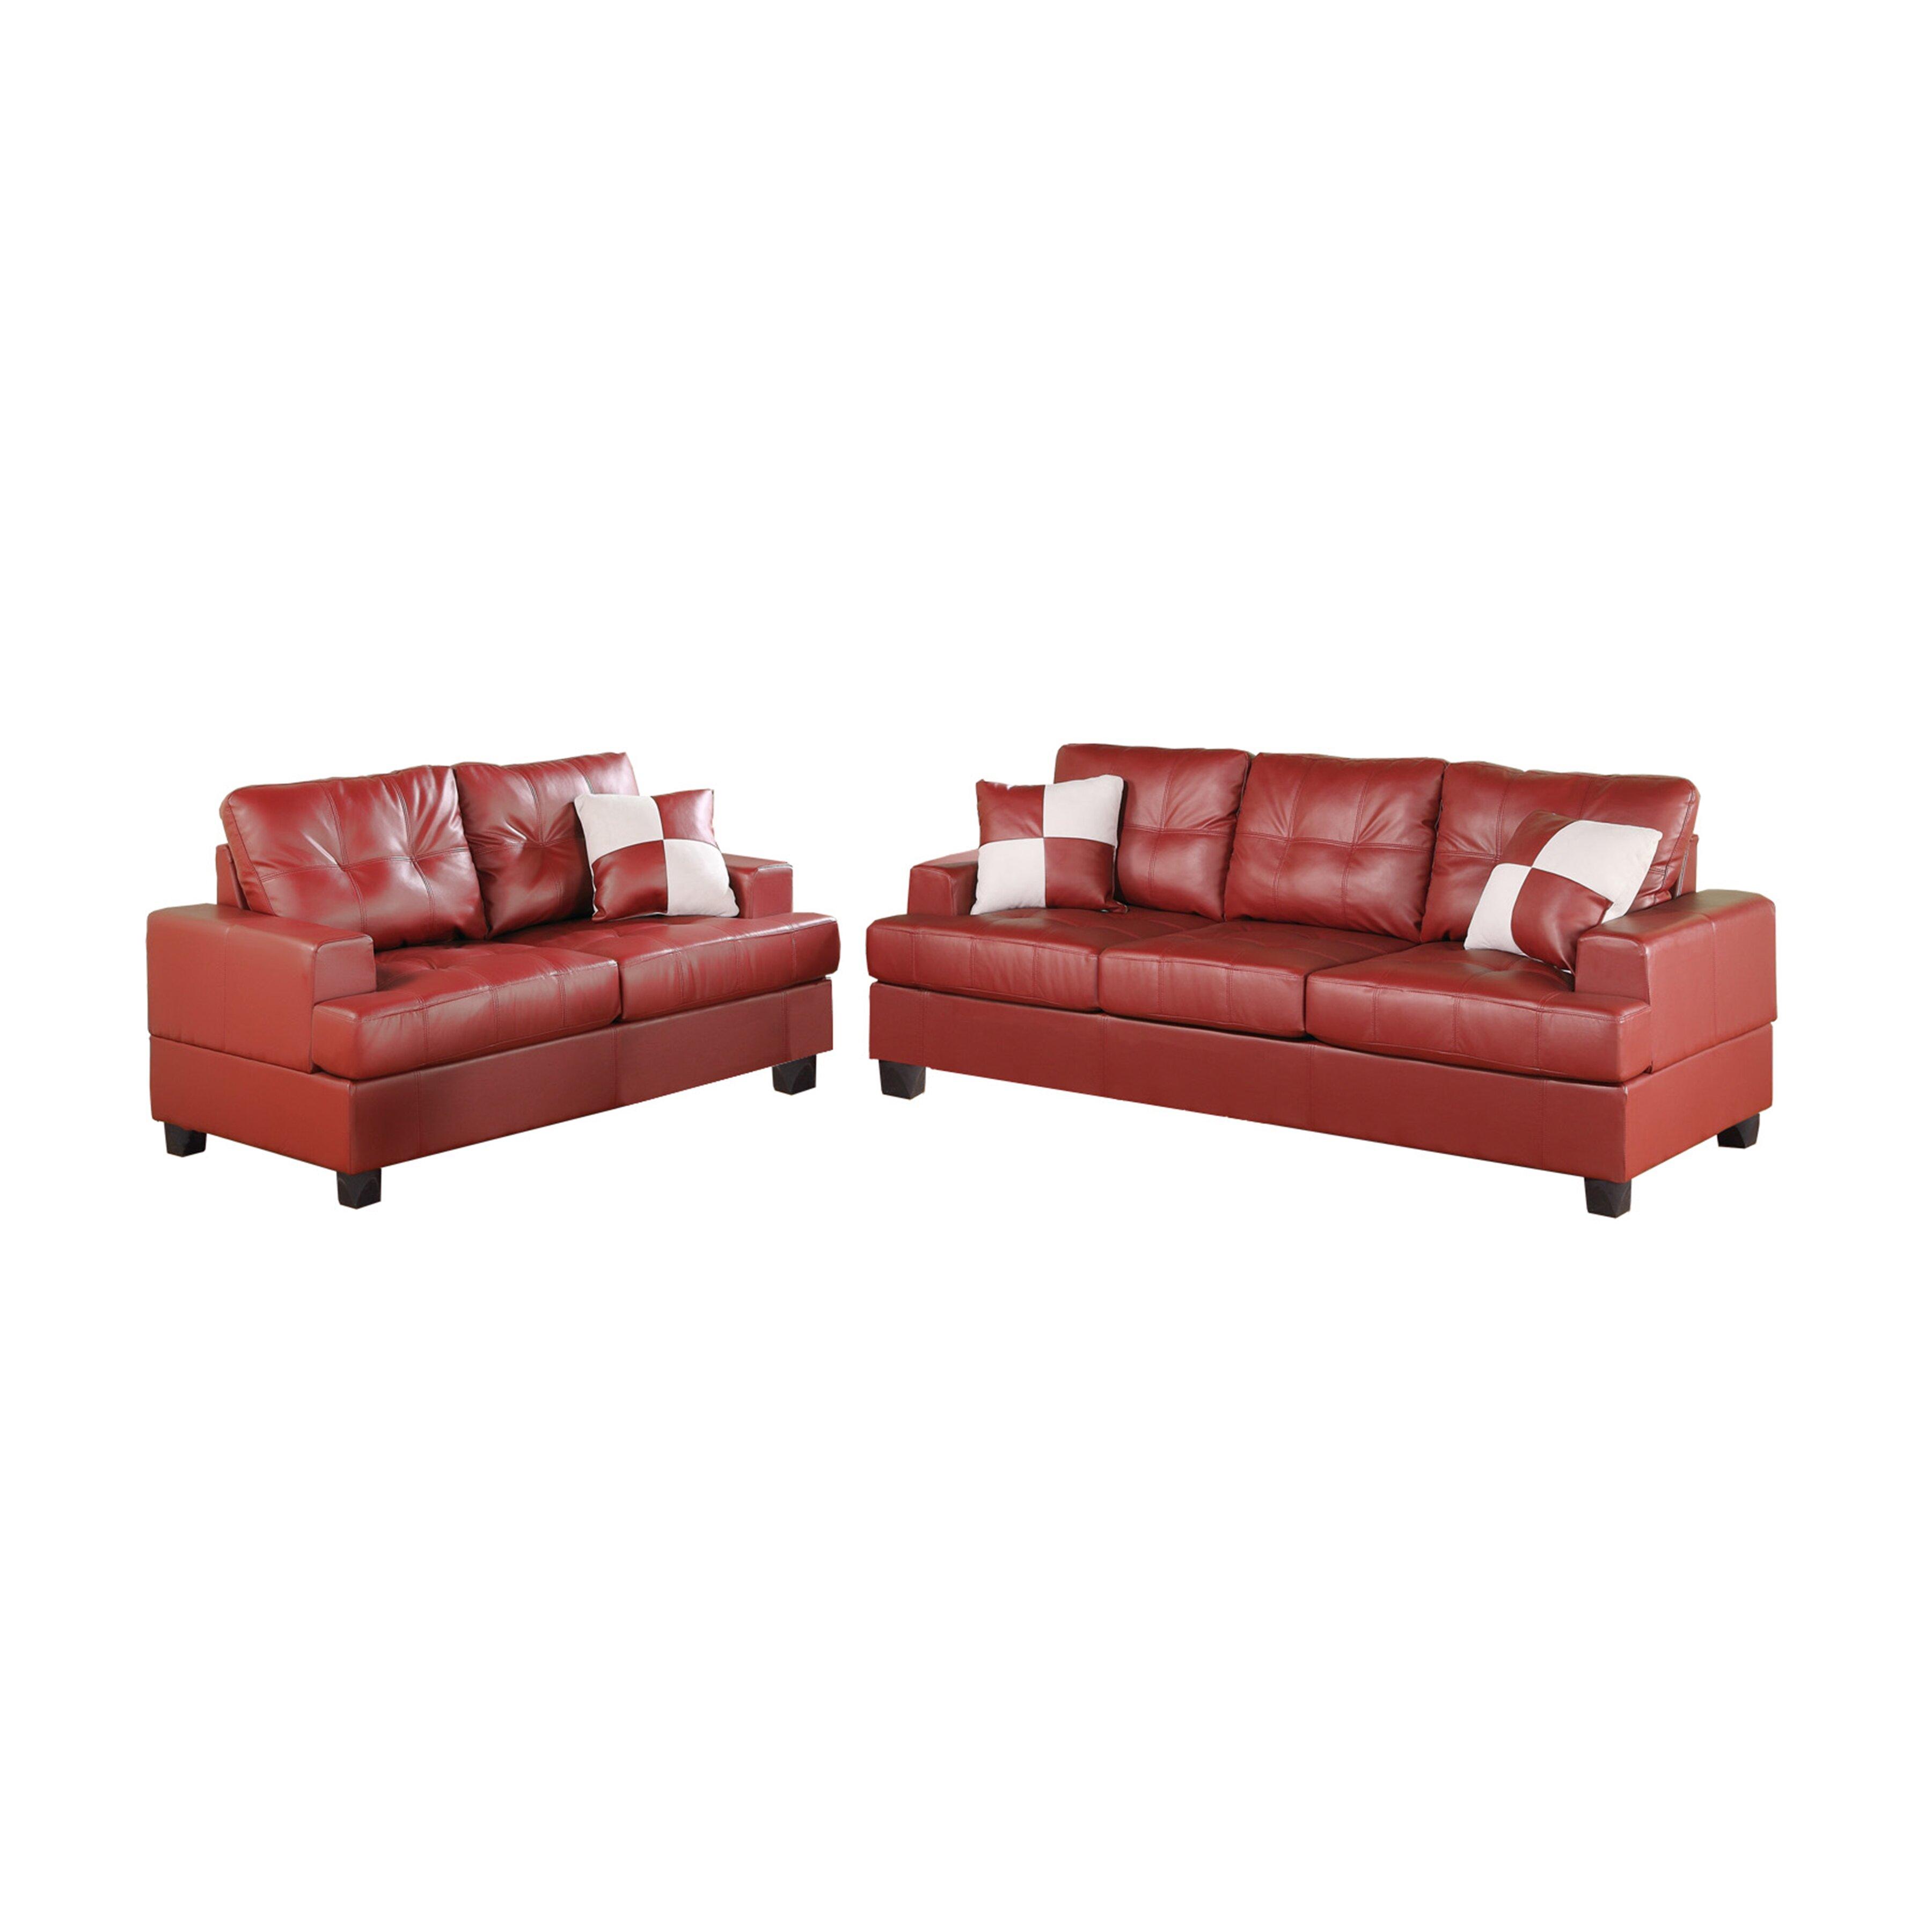 Poundex Bobkona Sherman Sofa And Loveseat Set Reviews Wayfair